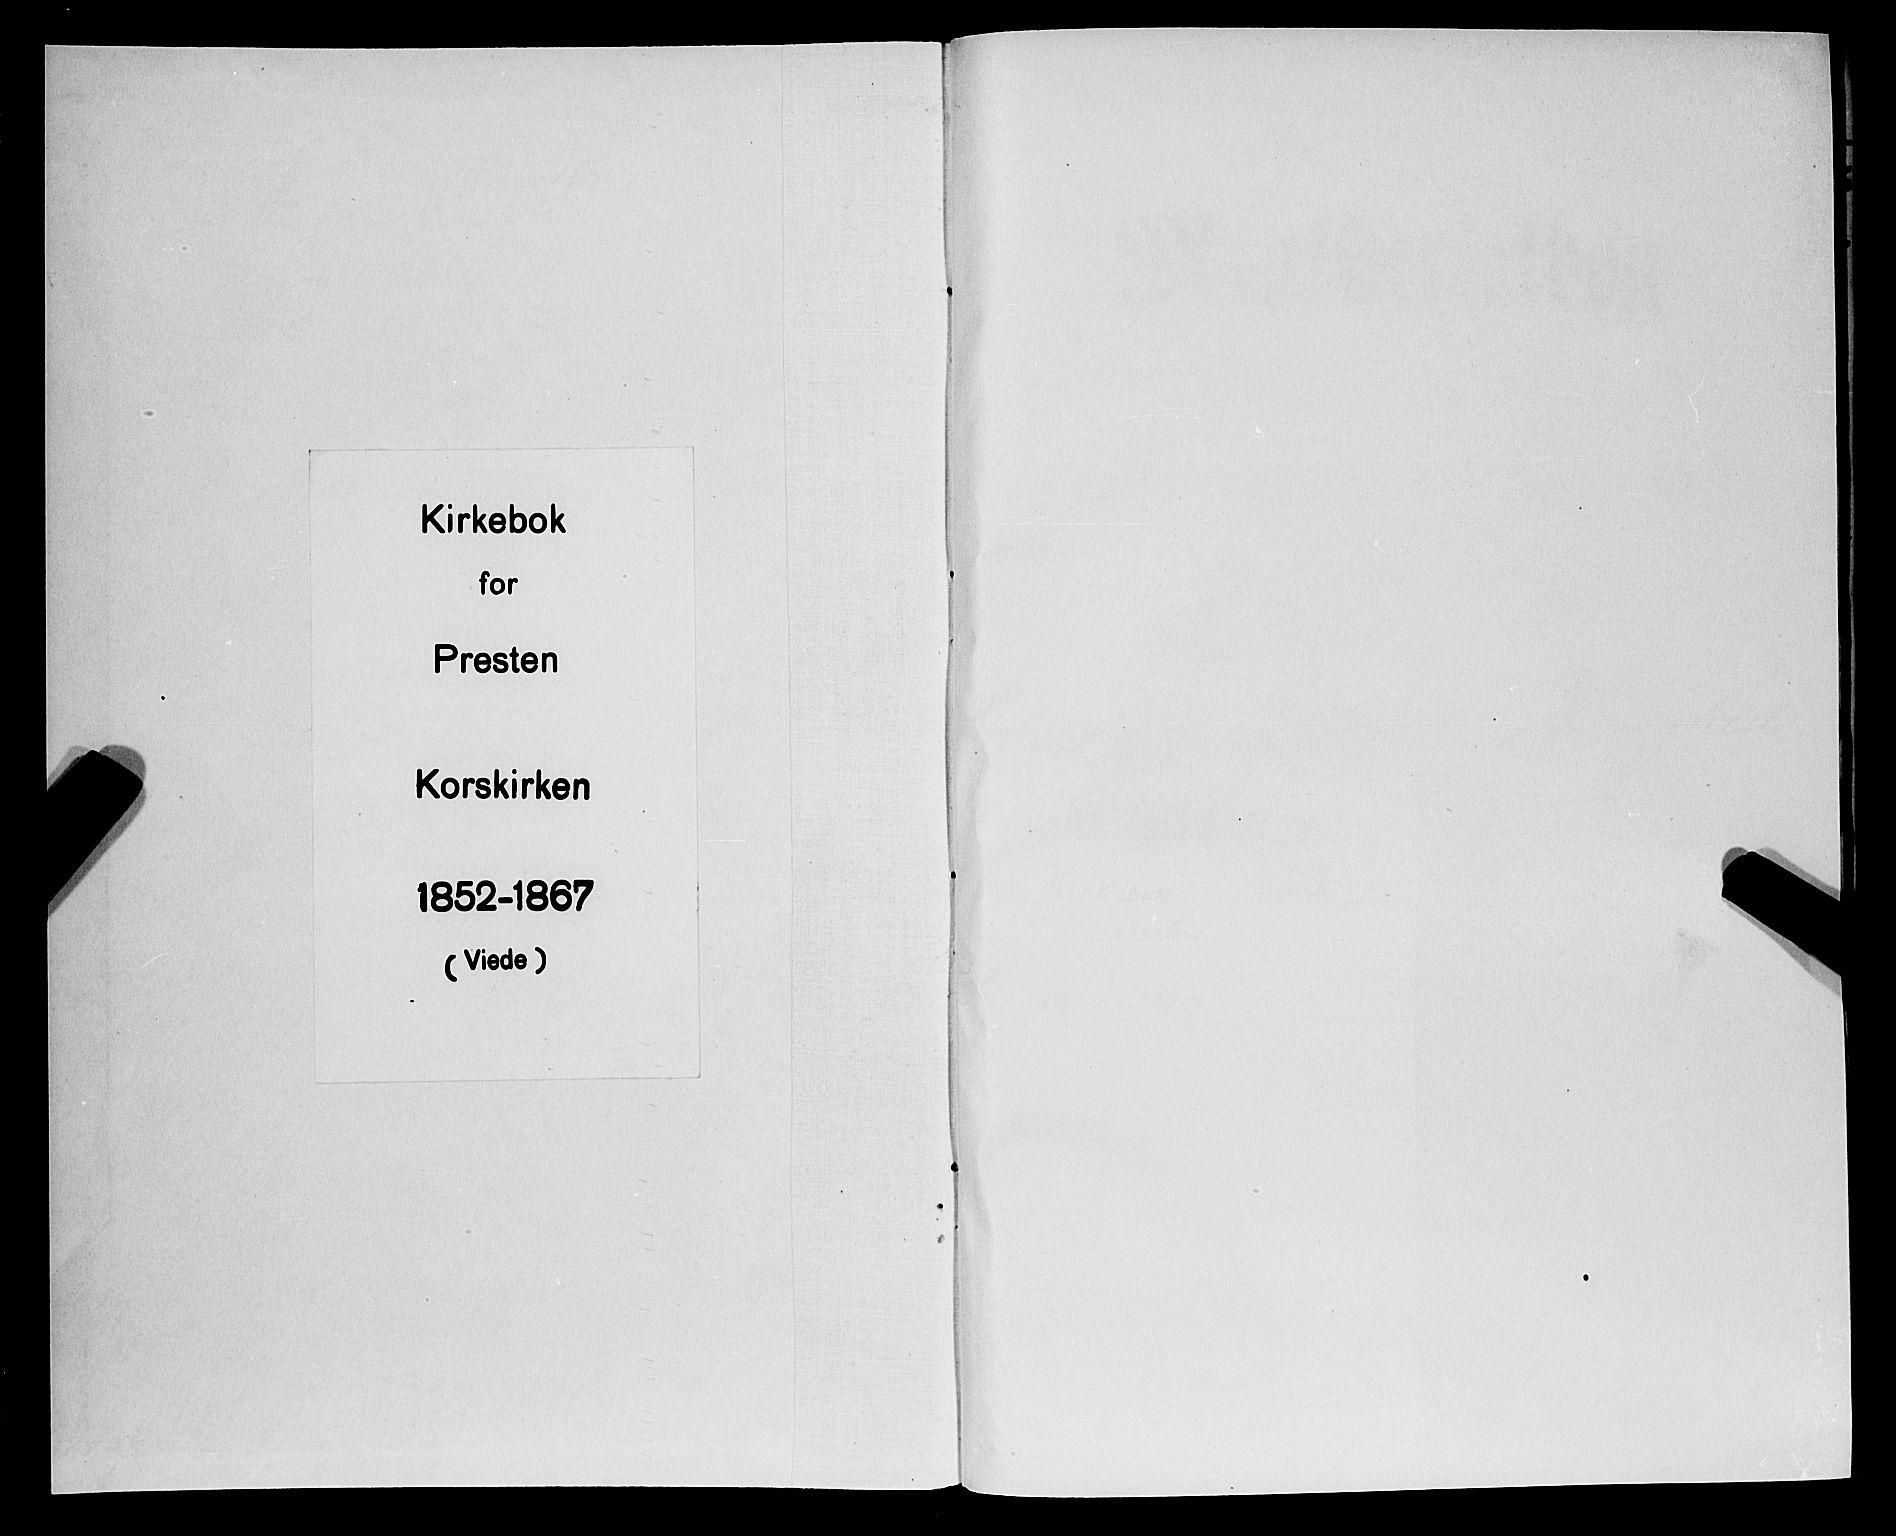 SAB, Korskirken Sokneprestembete, H/Haa/L0035: Ministerialbok nr. D 2, 1852-1867